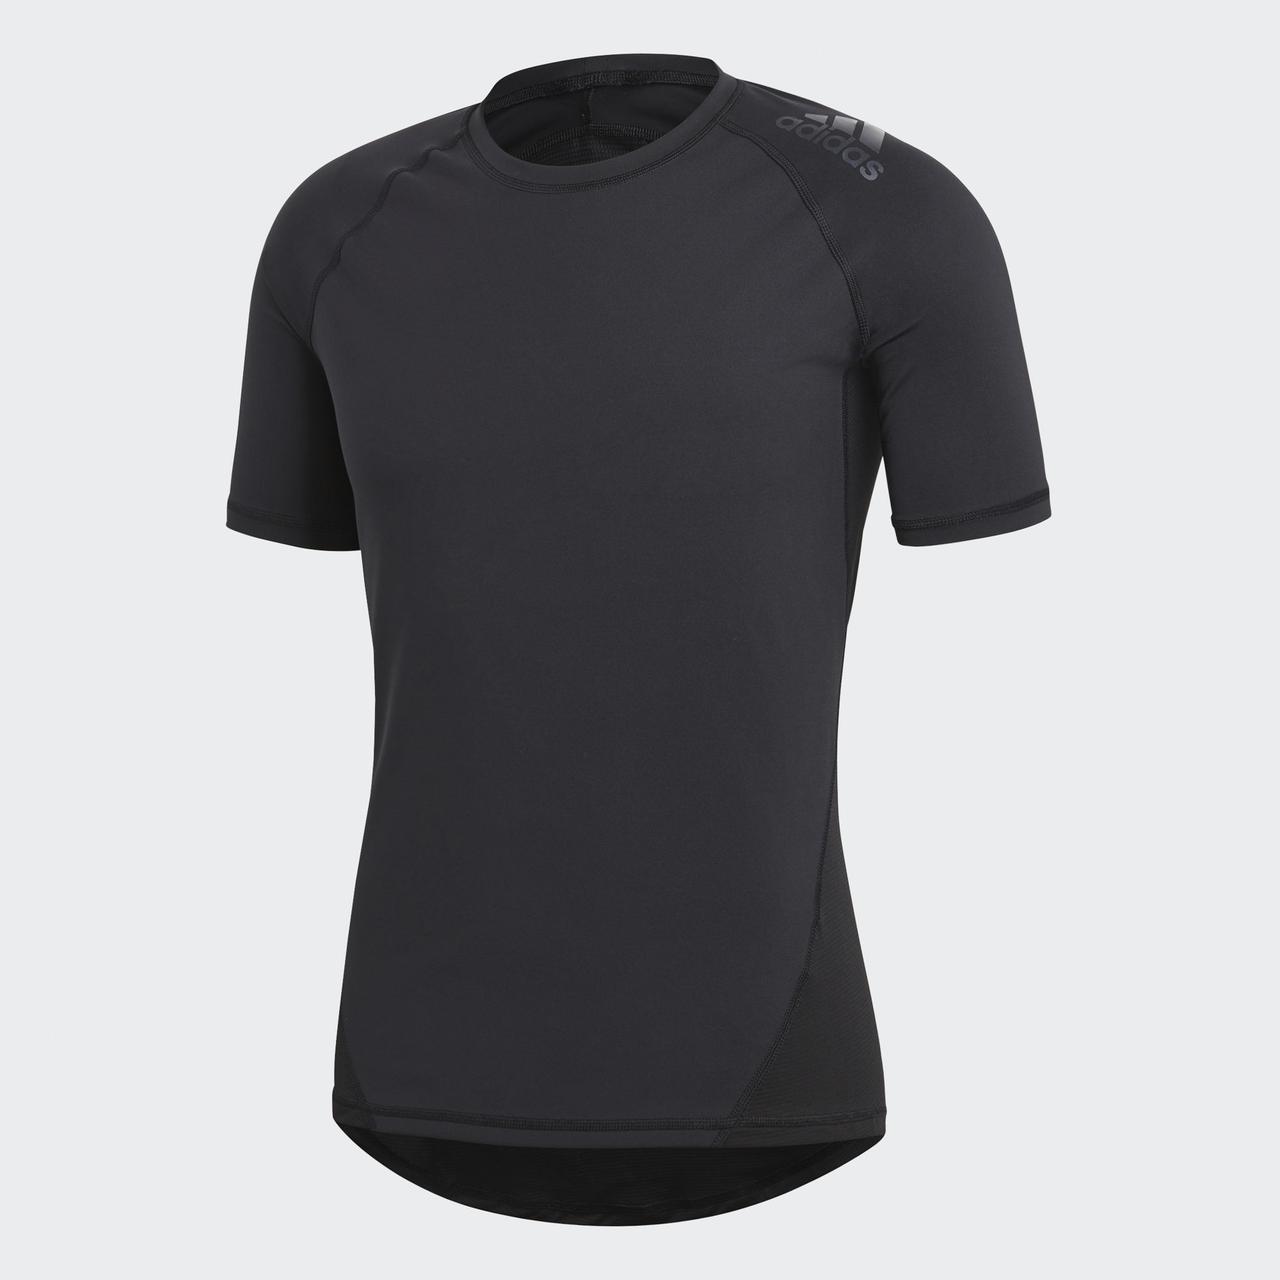 Мужская футболка Adidas Performance Alphaskin Sport (Артикул: CF7235)